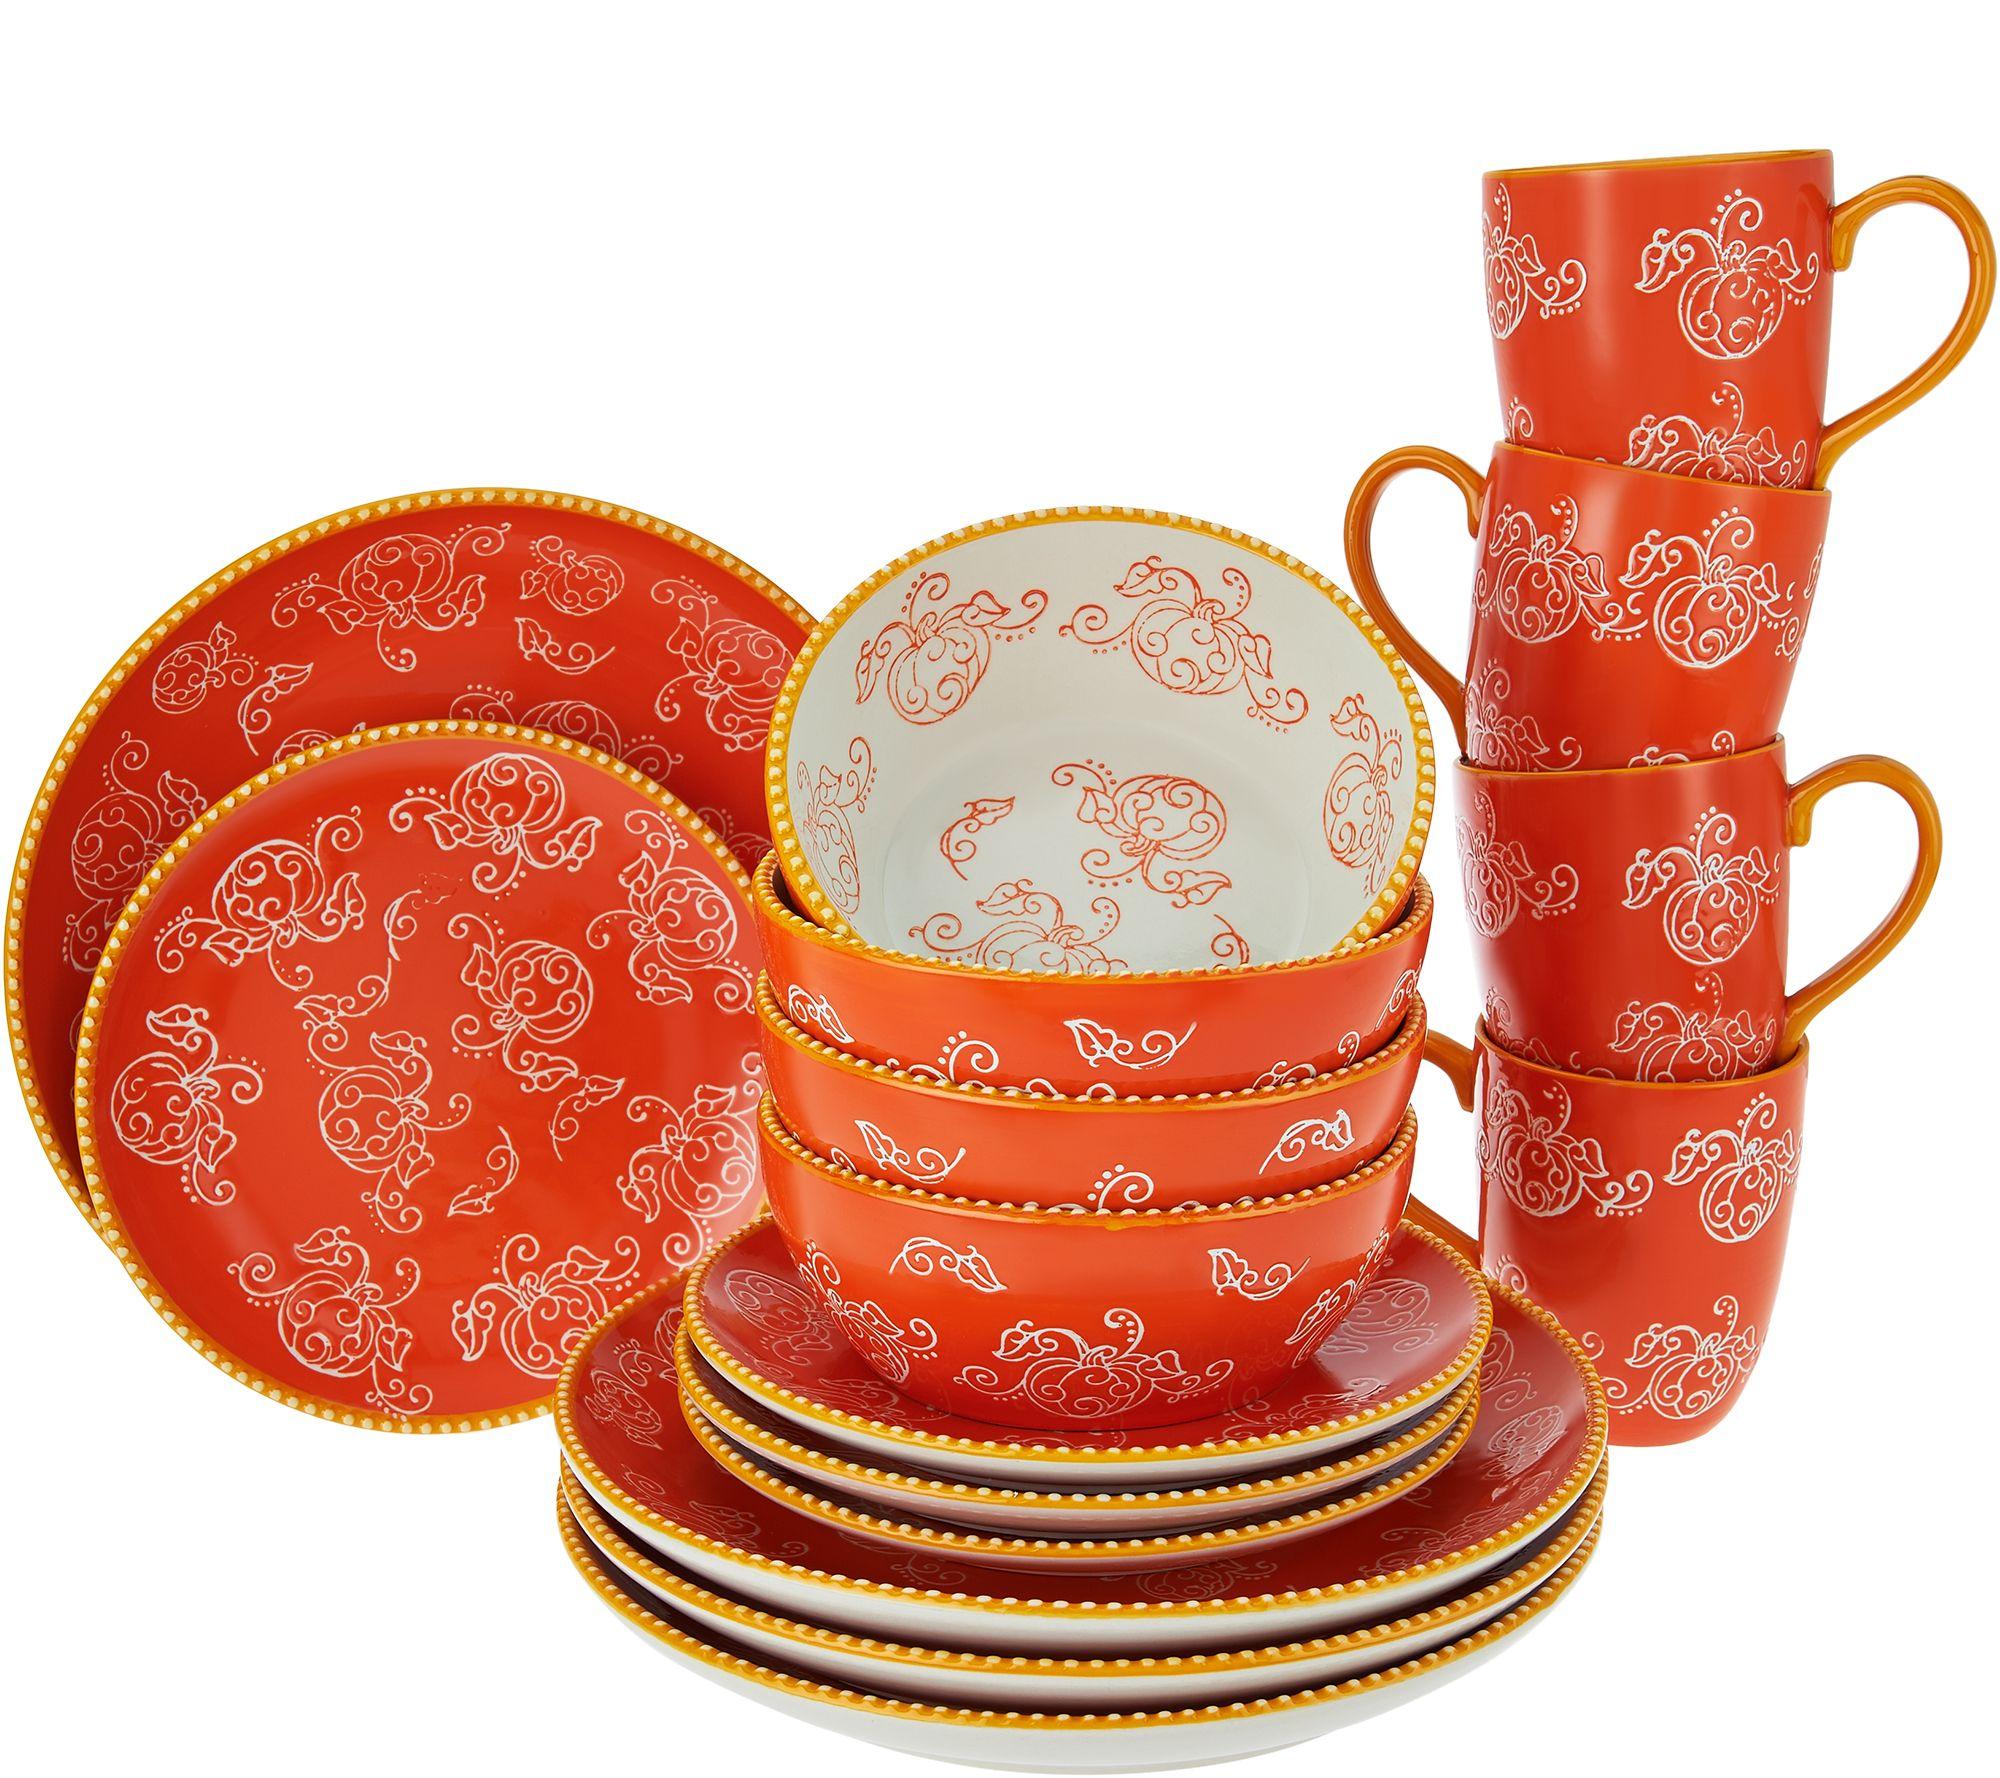 sc 1 st  QVC.com & Temp-tations Floral Lace 16-pc Dinnerware Set - Page 1 \u2014 QVC.com